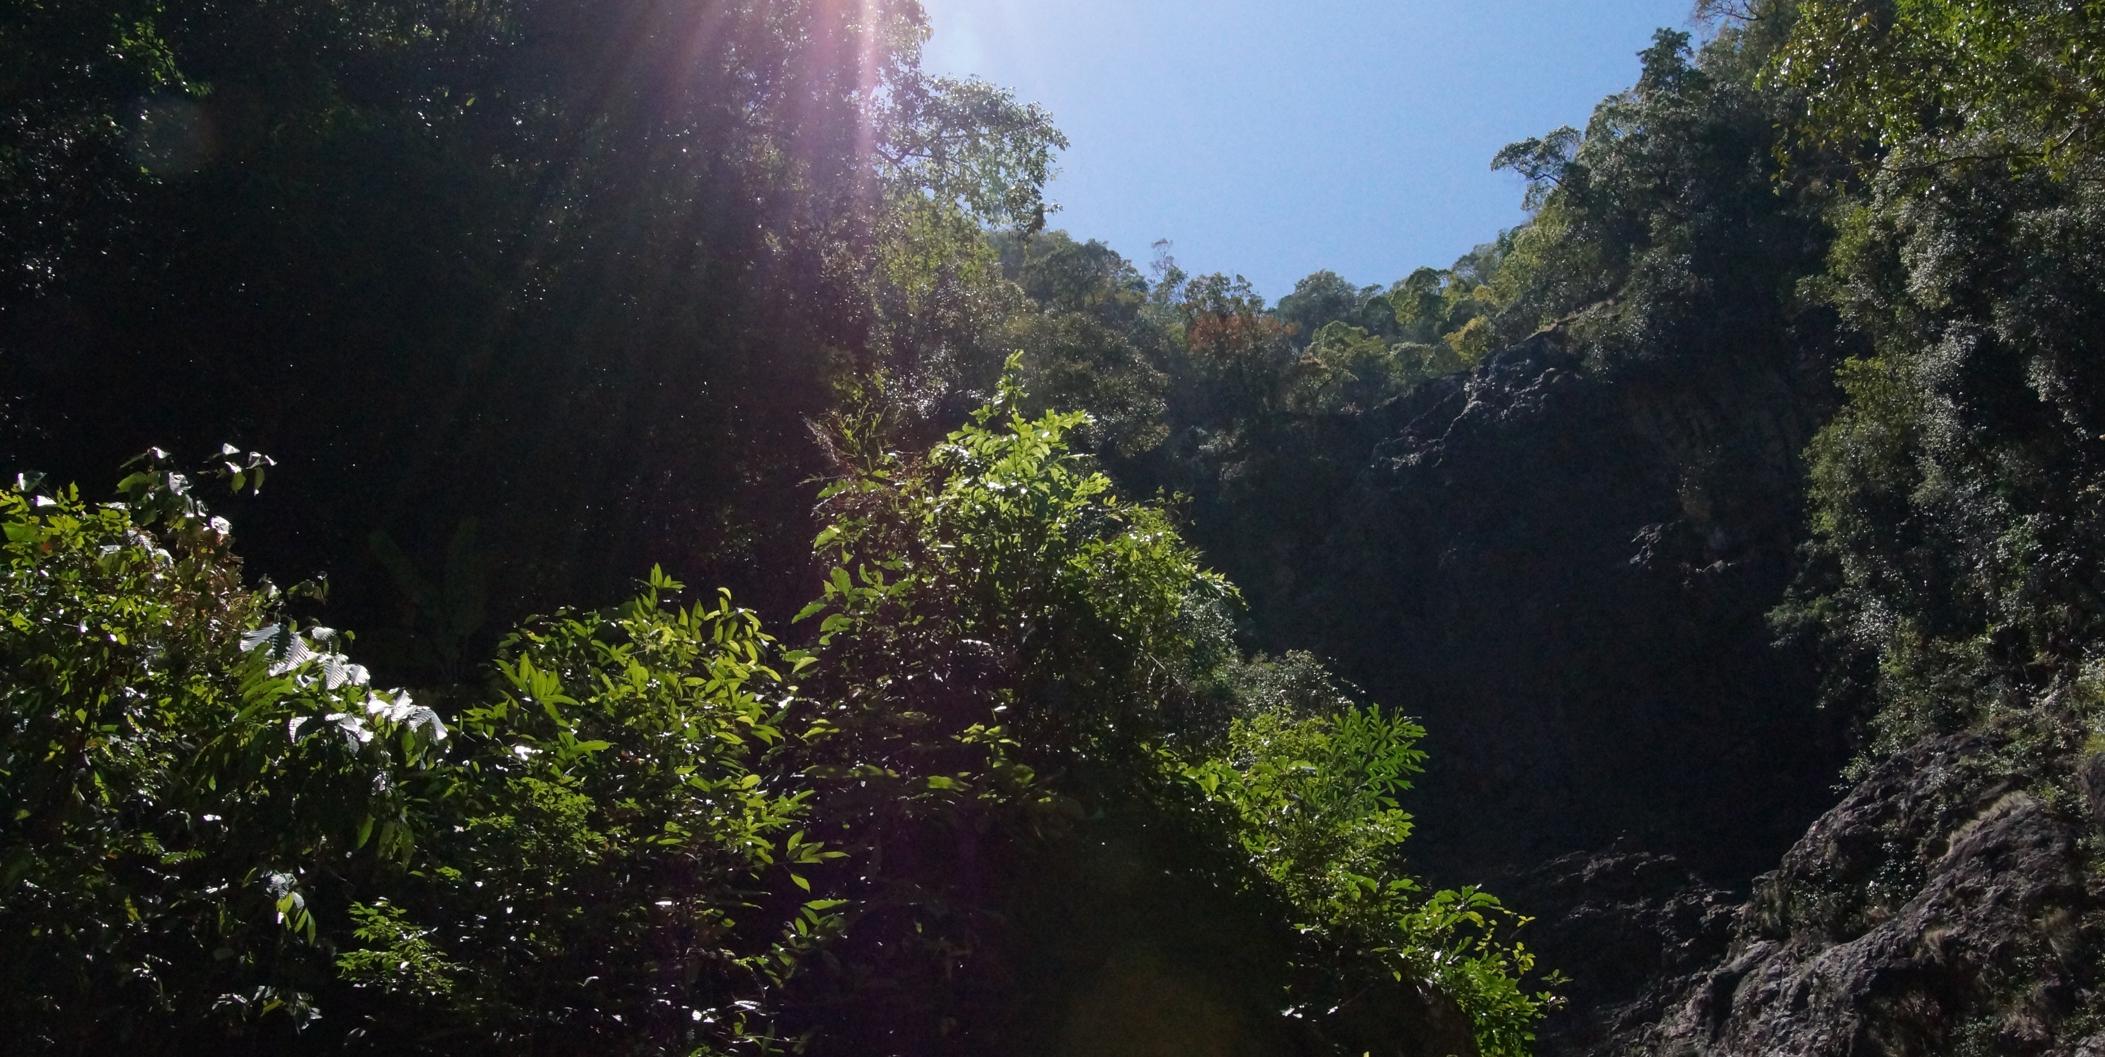 Udsigt i junglen ved Tamarun Waterfall, Langkawi. Foto: Lizandra Pultz